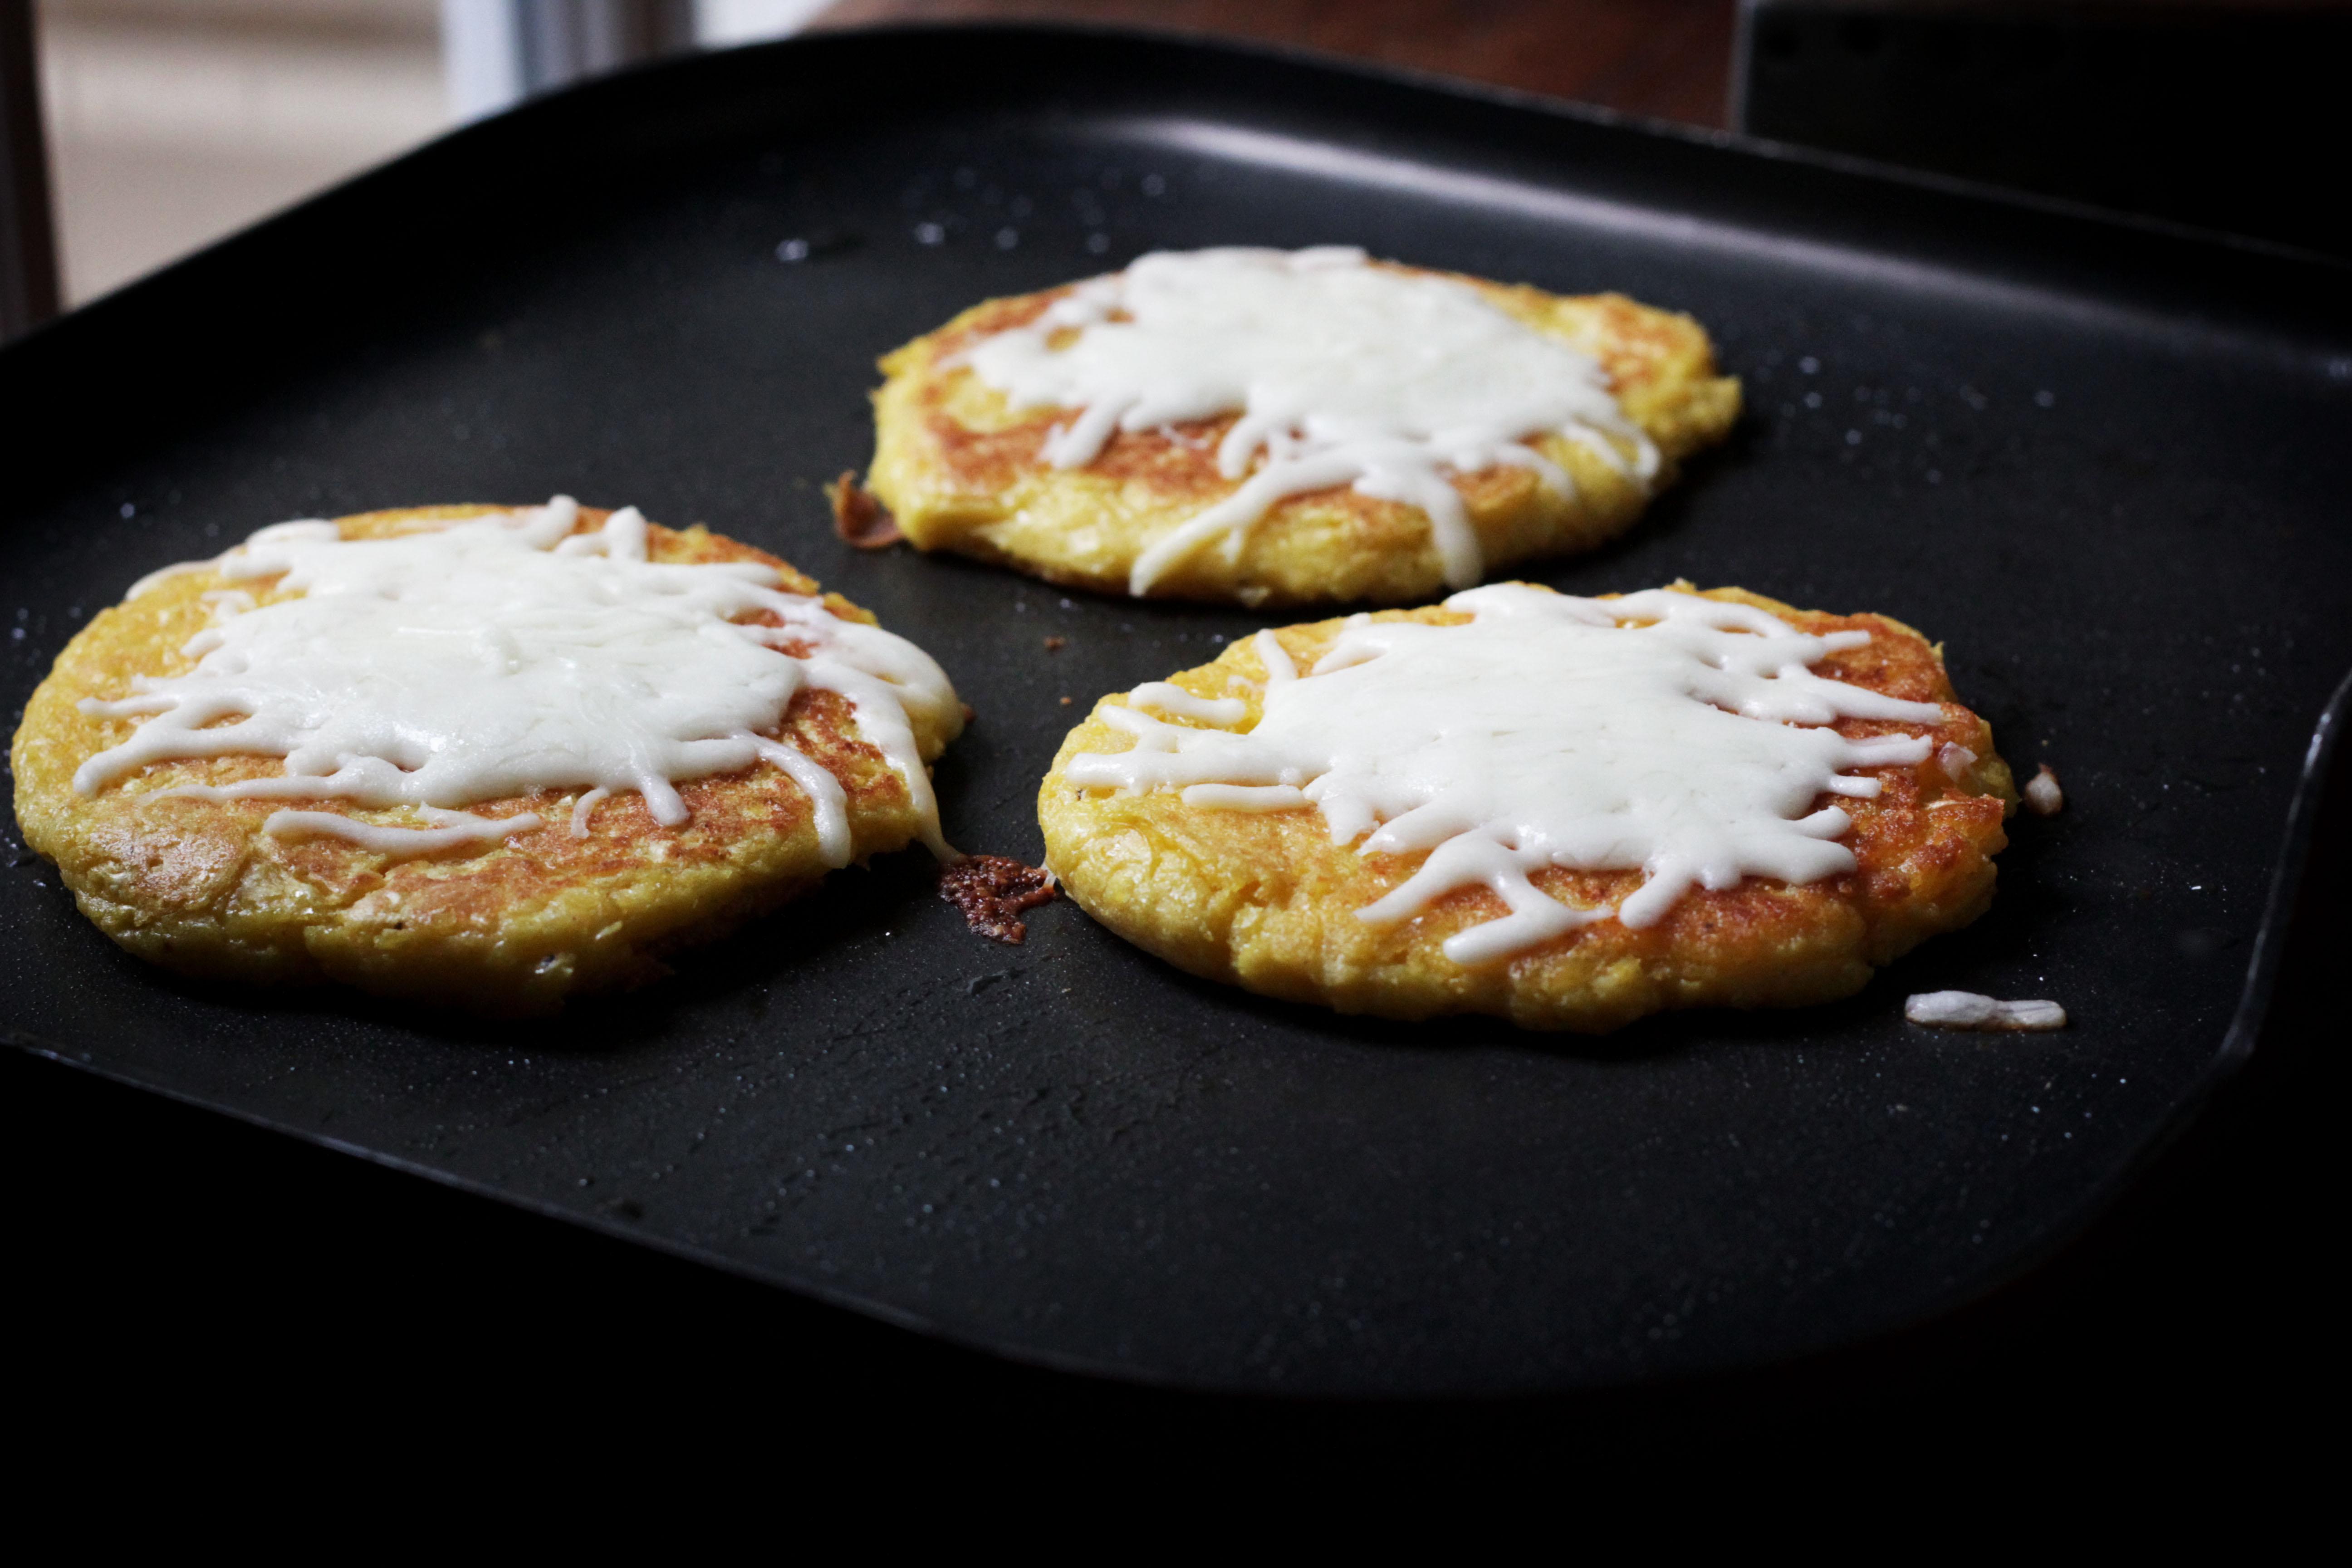 Fresh corncakes with cheese cachapas global table adventure venezuelaodcipeg2790 forumfinder Gallery